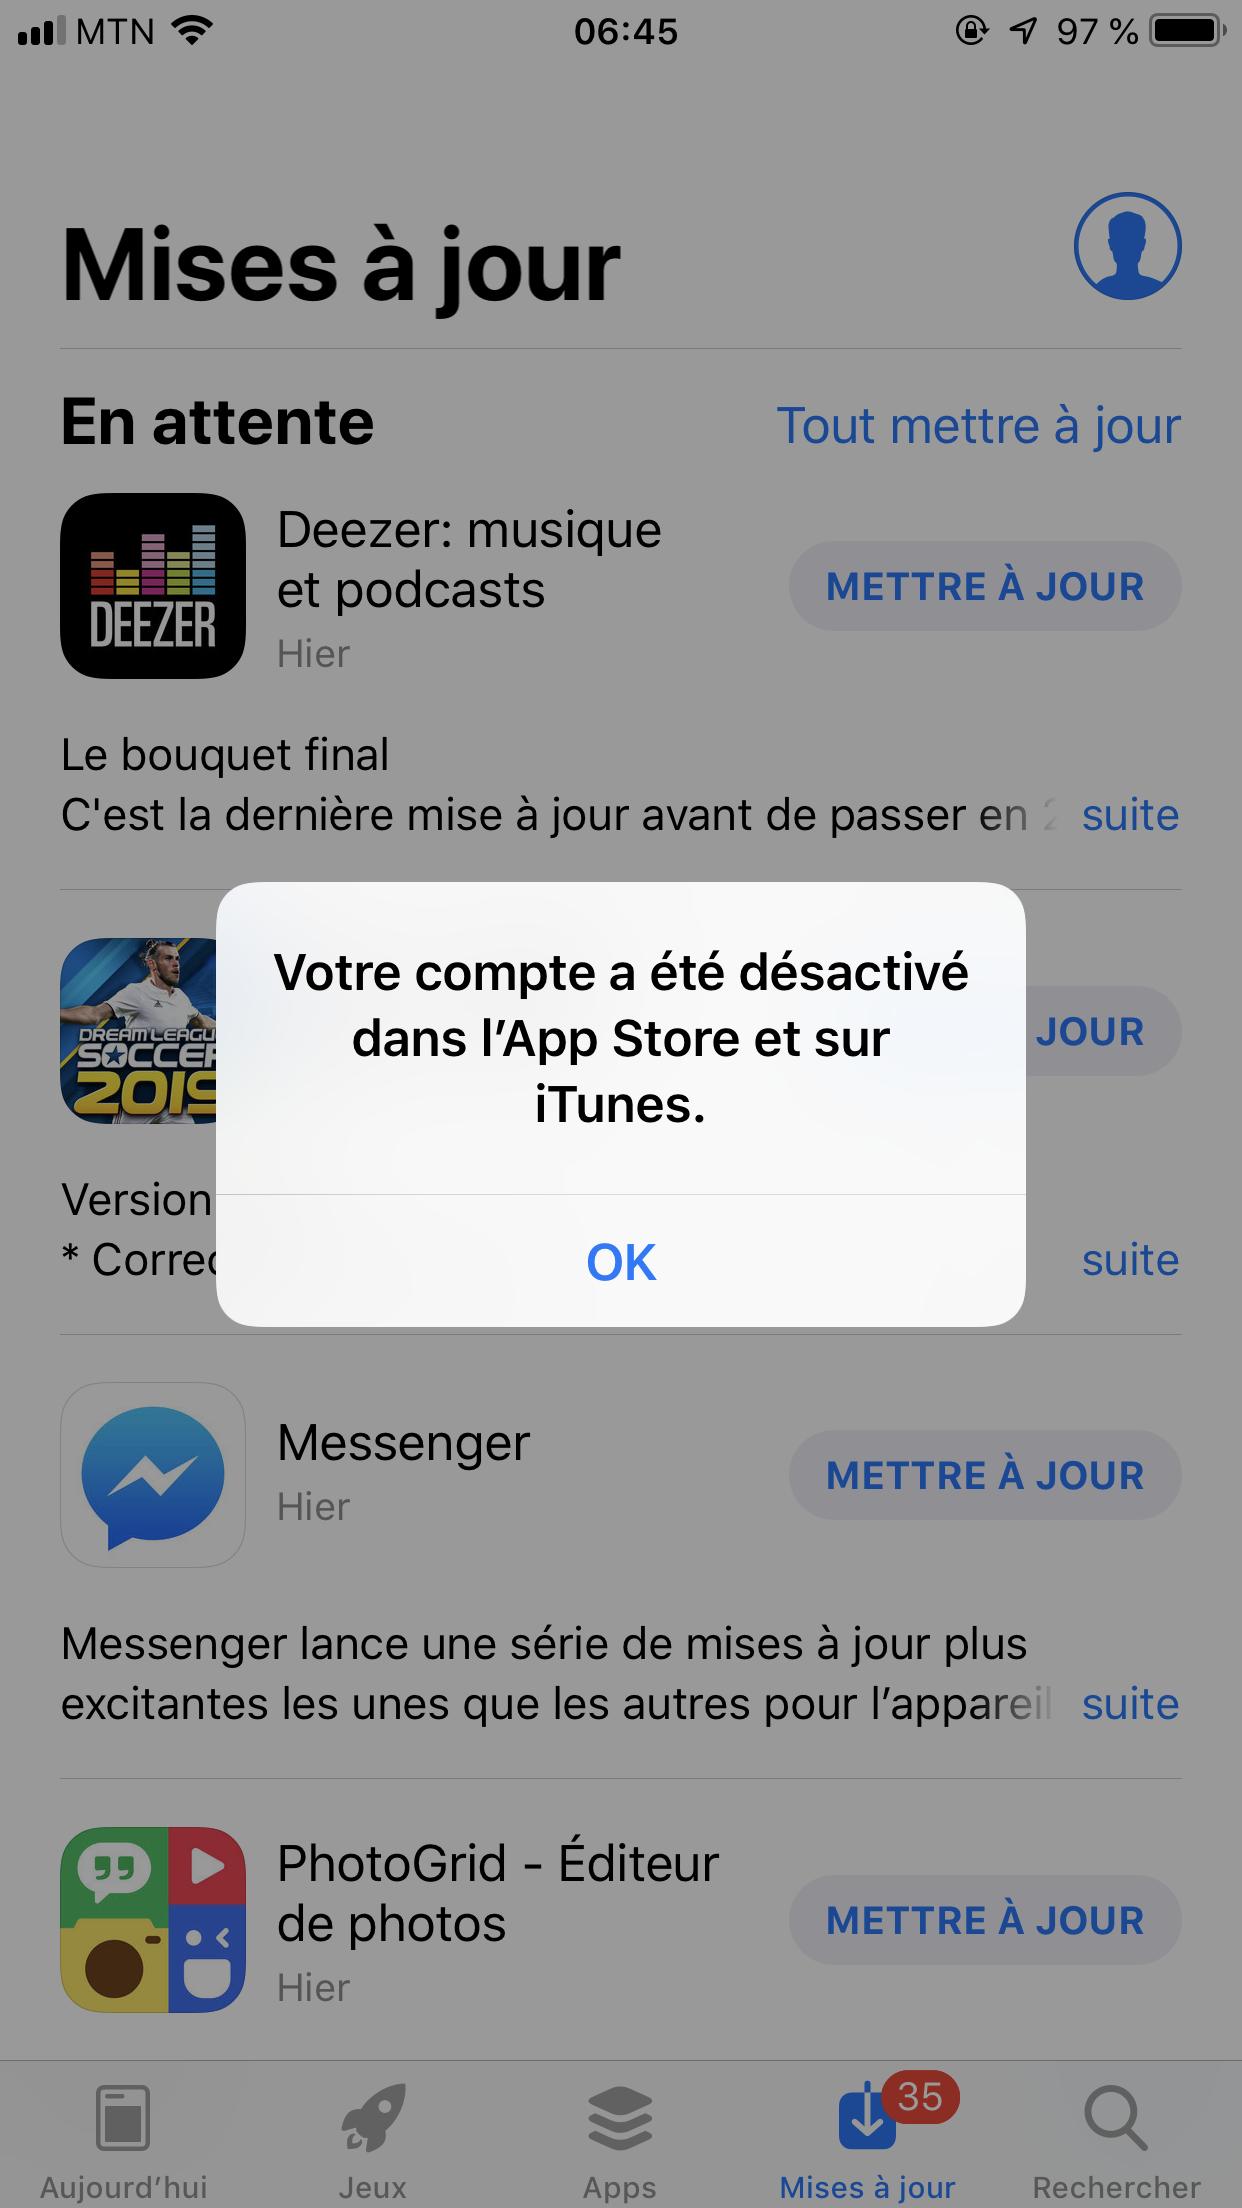 App store log in